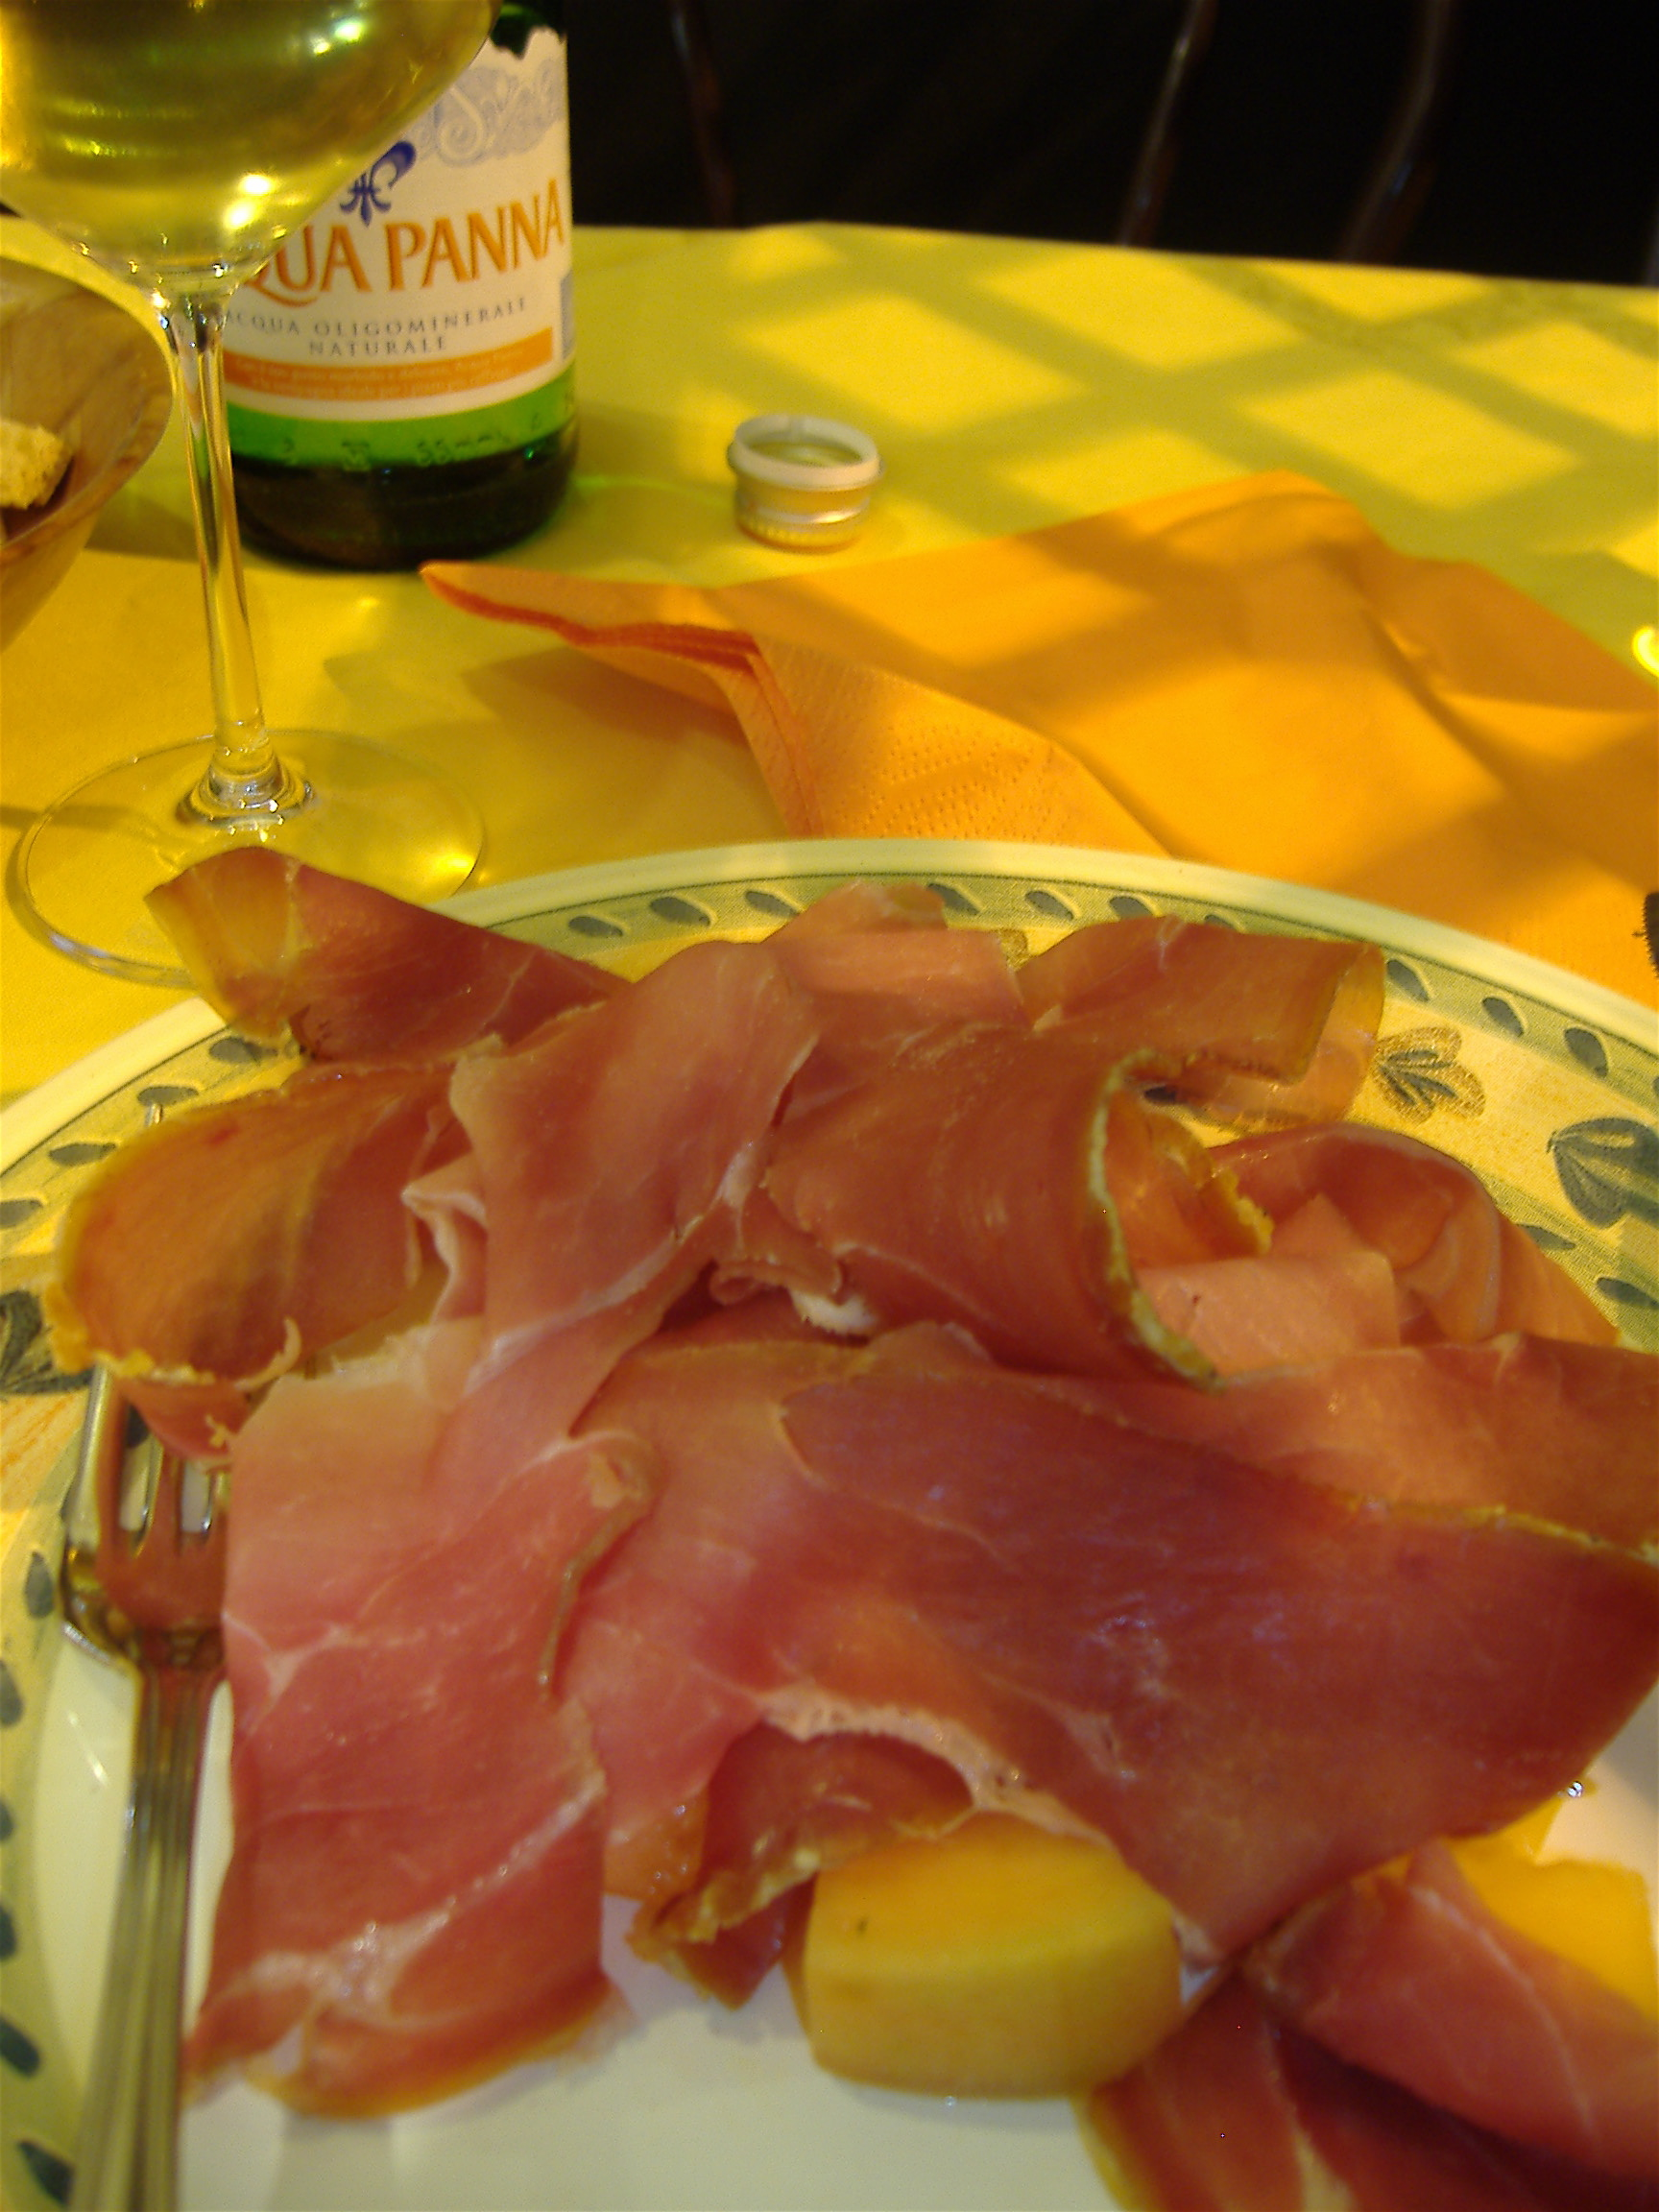 Prosciutto & Melon - Florence, Italy